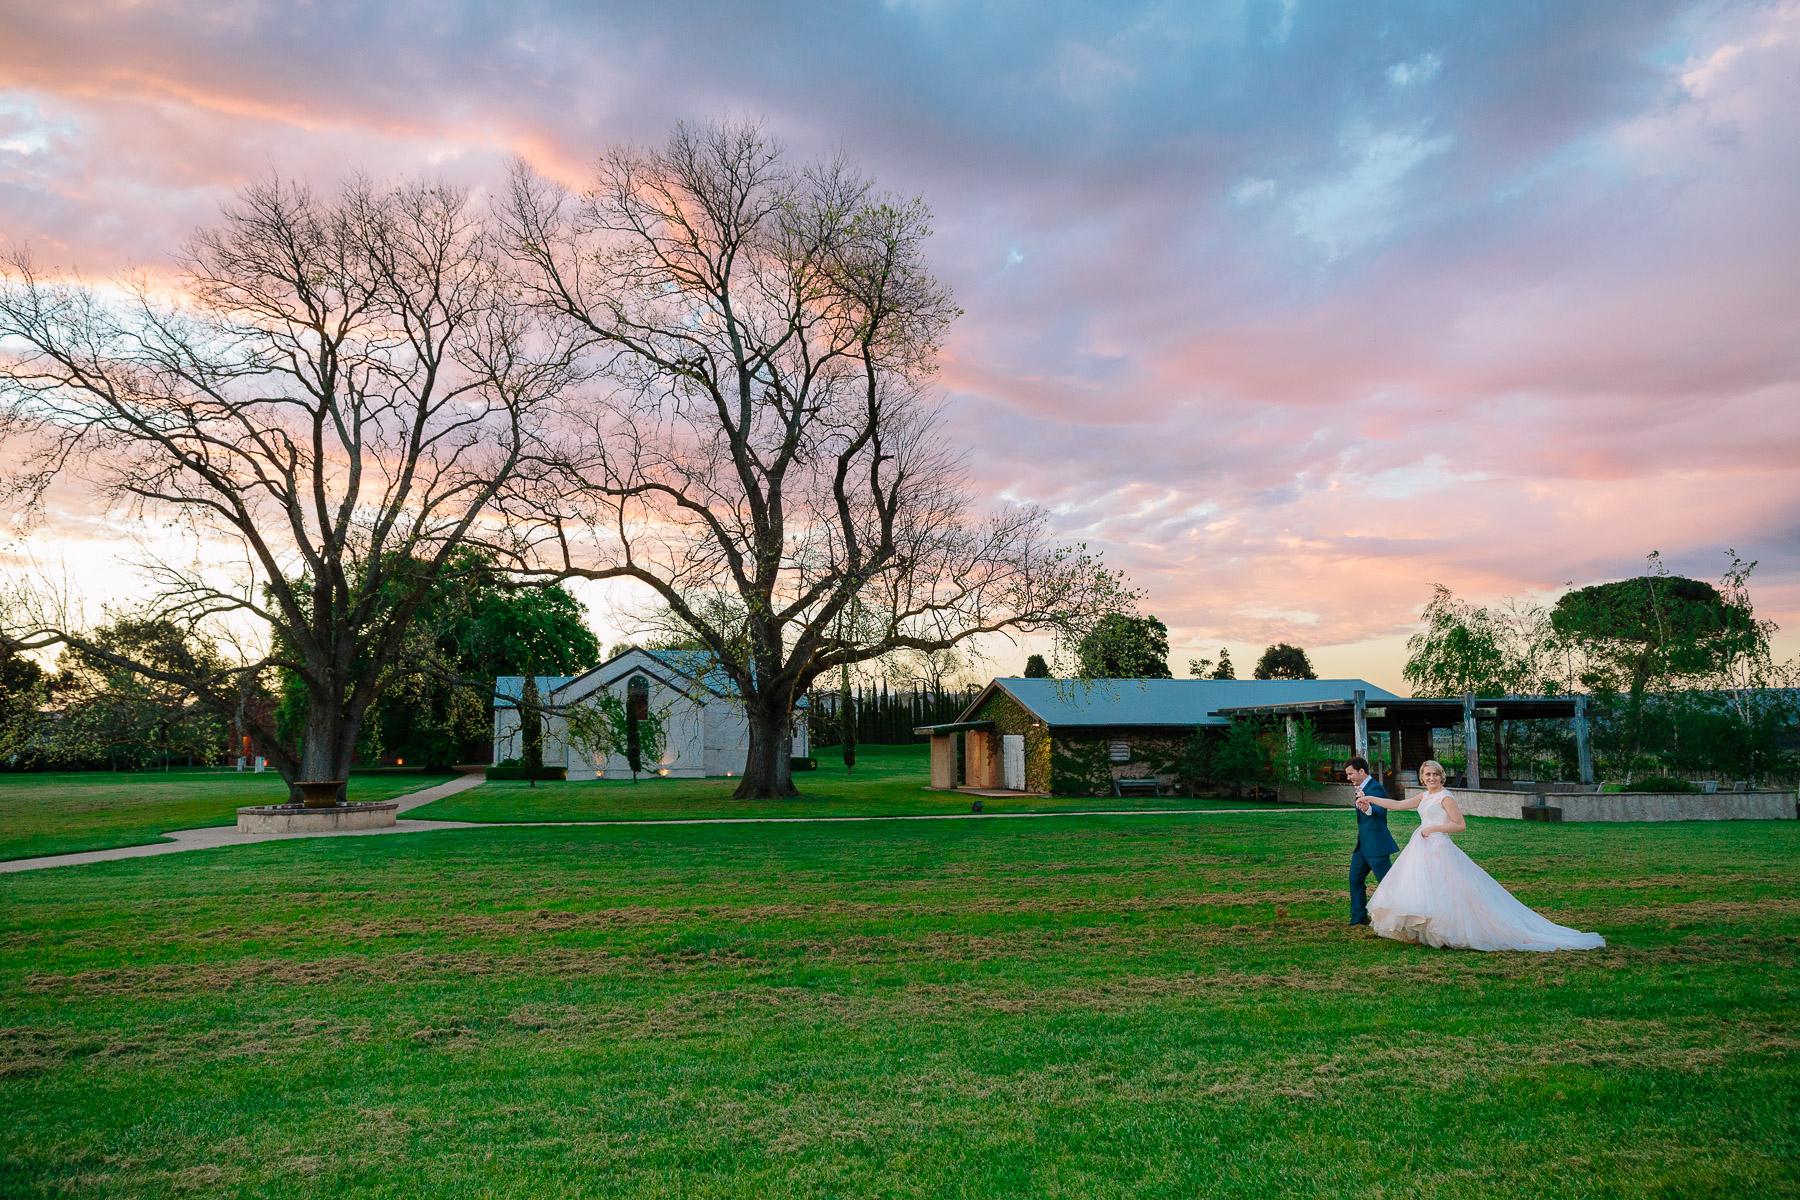 Marnie_and_Charlie_Yarra_Valley_Wedding_Blog-91.jpg